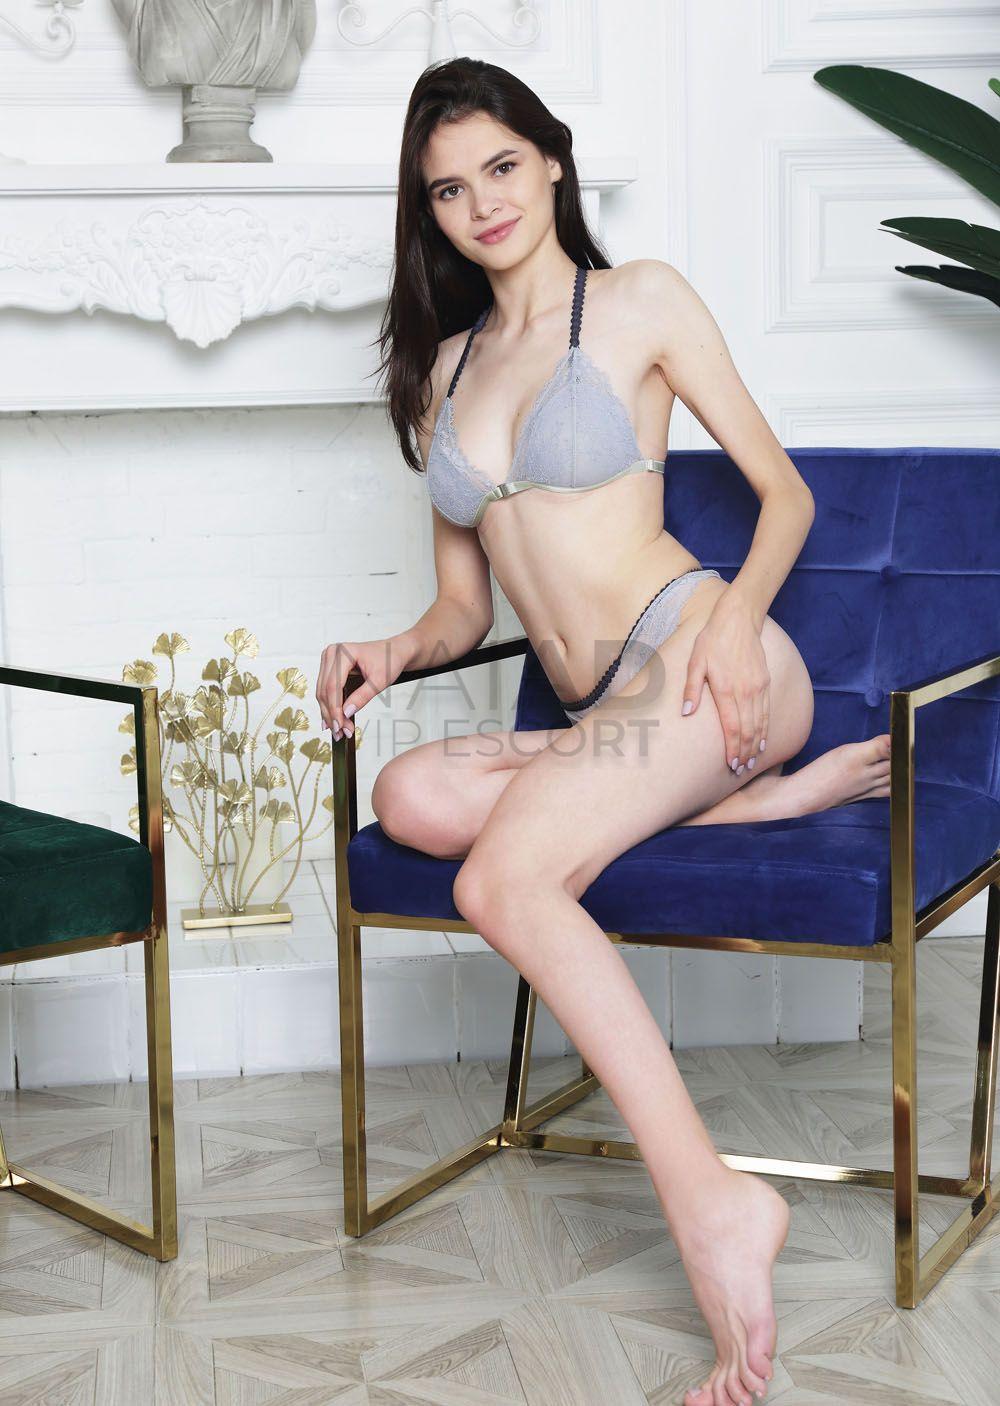 Photo of Franceska on Naiad vip escort service in Paris